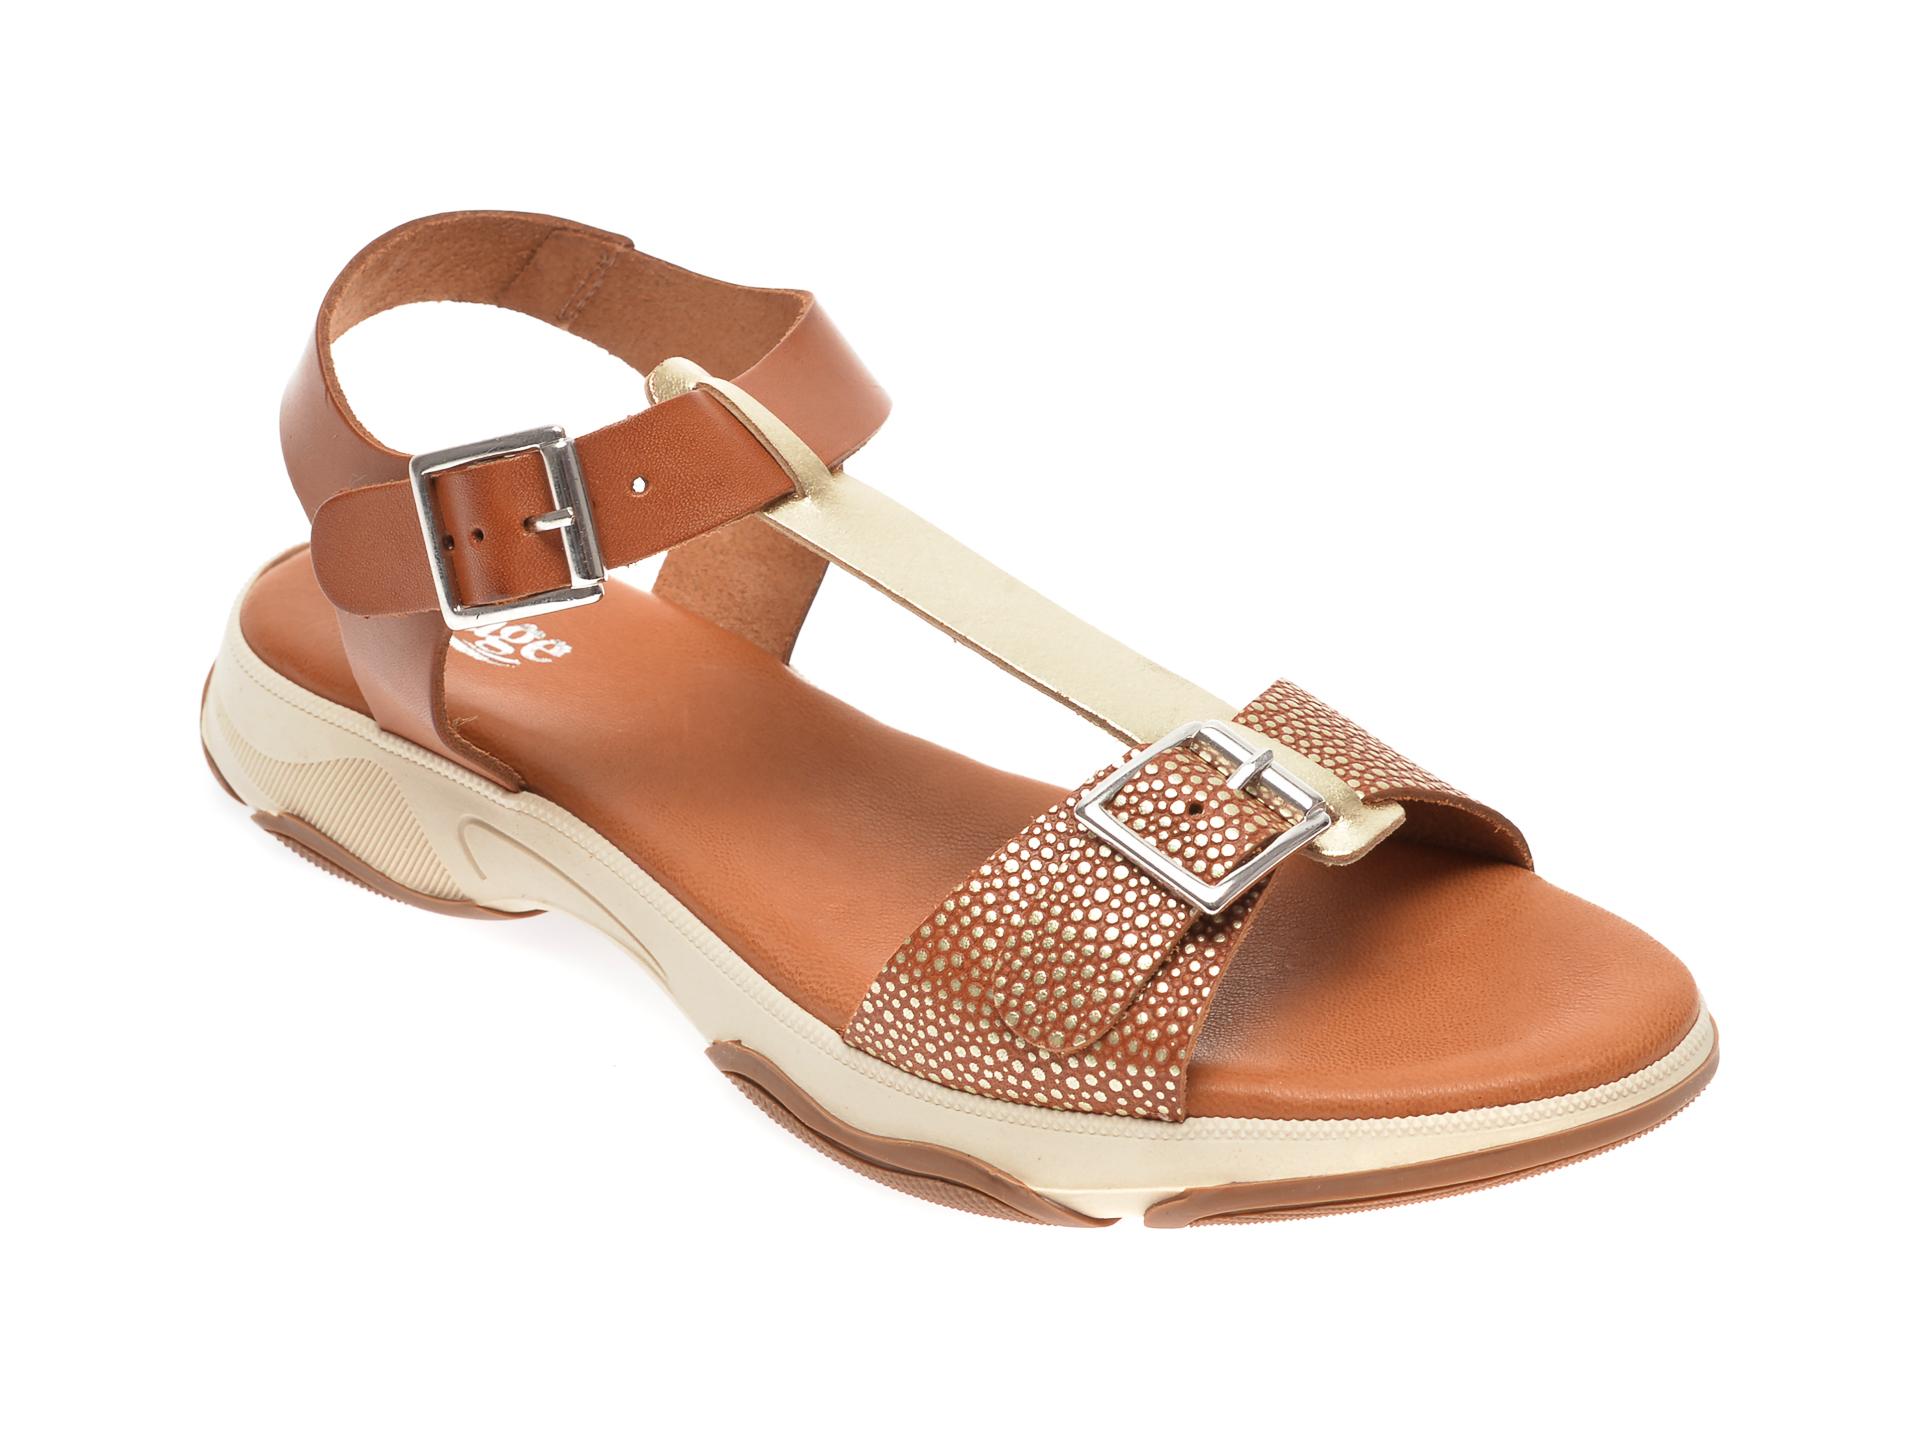 Sandale IMAGE maro, 1335E, din piele naturala New